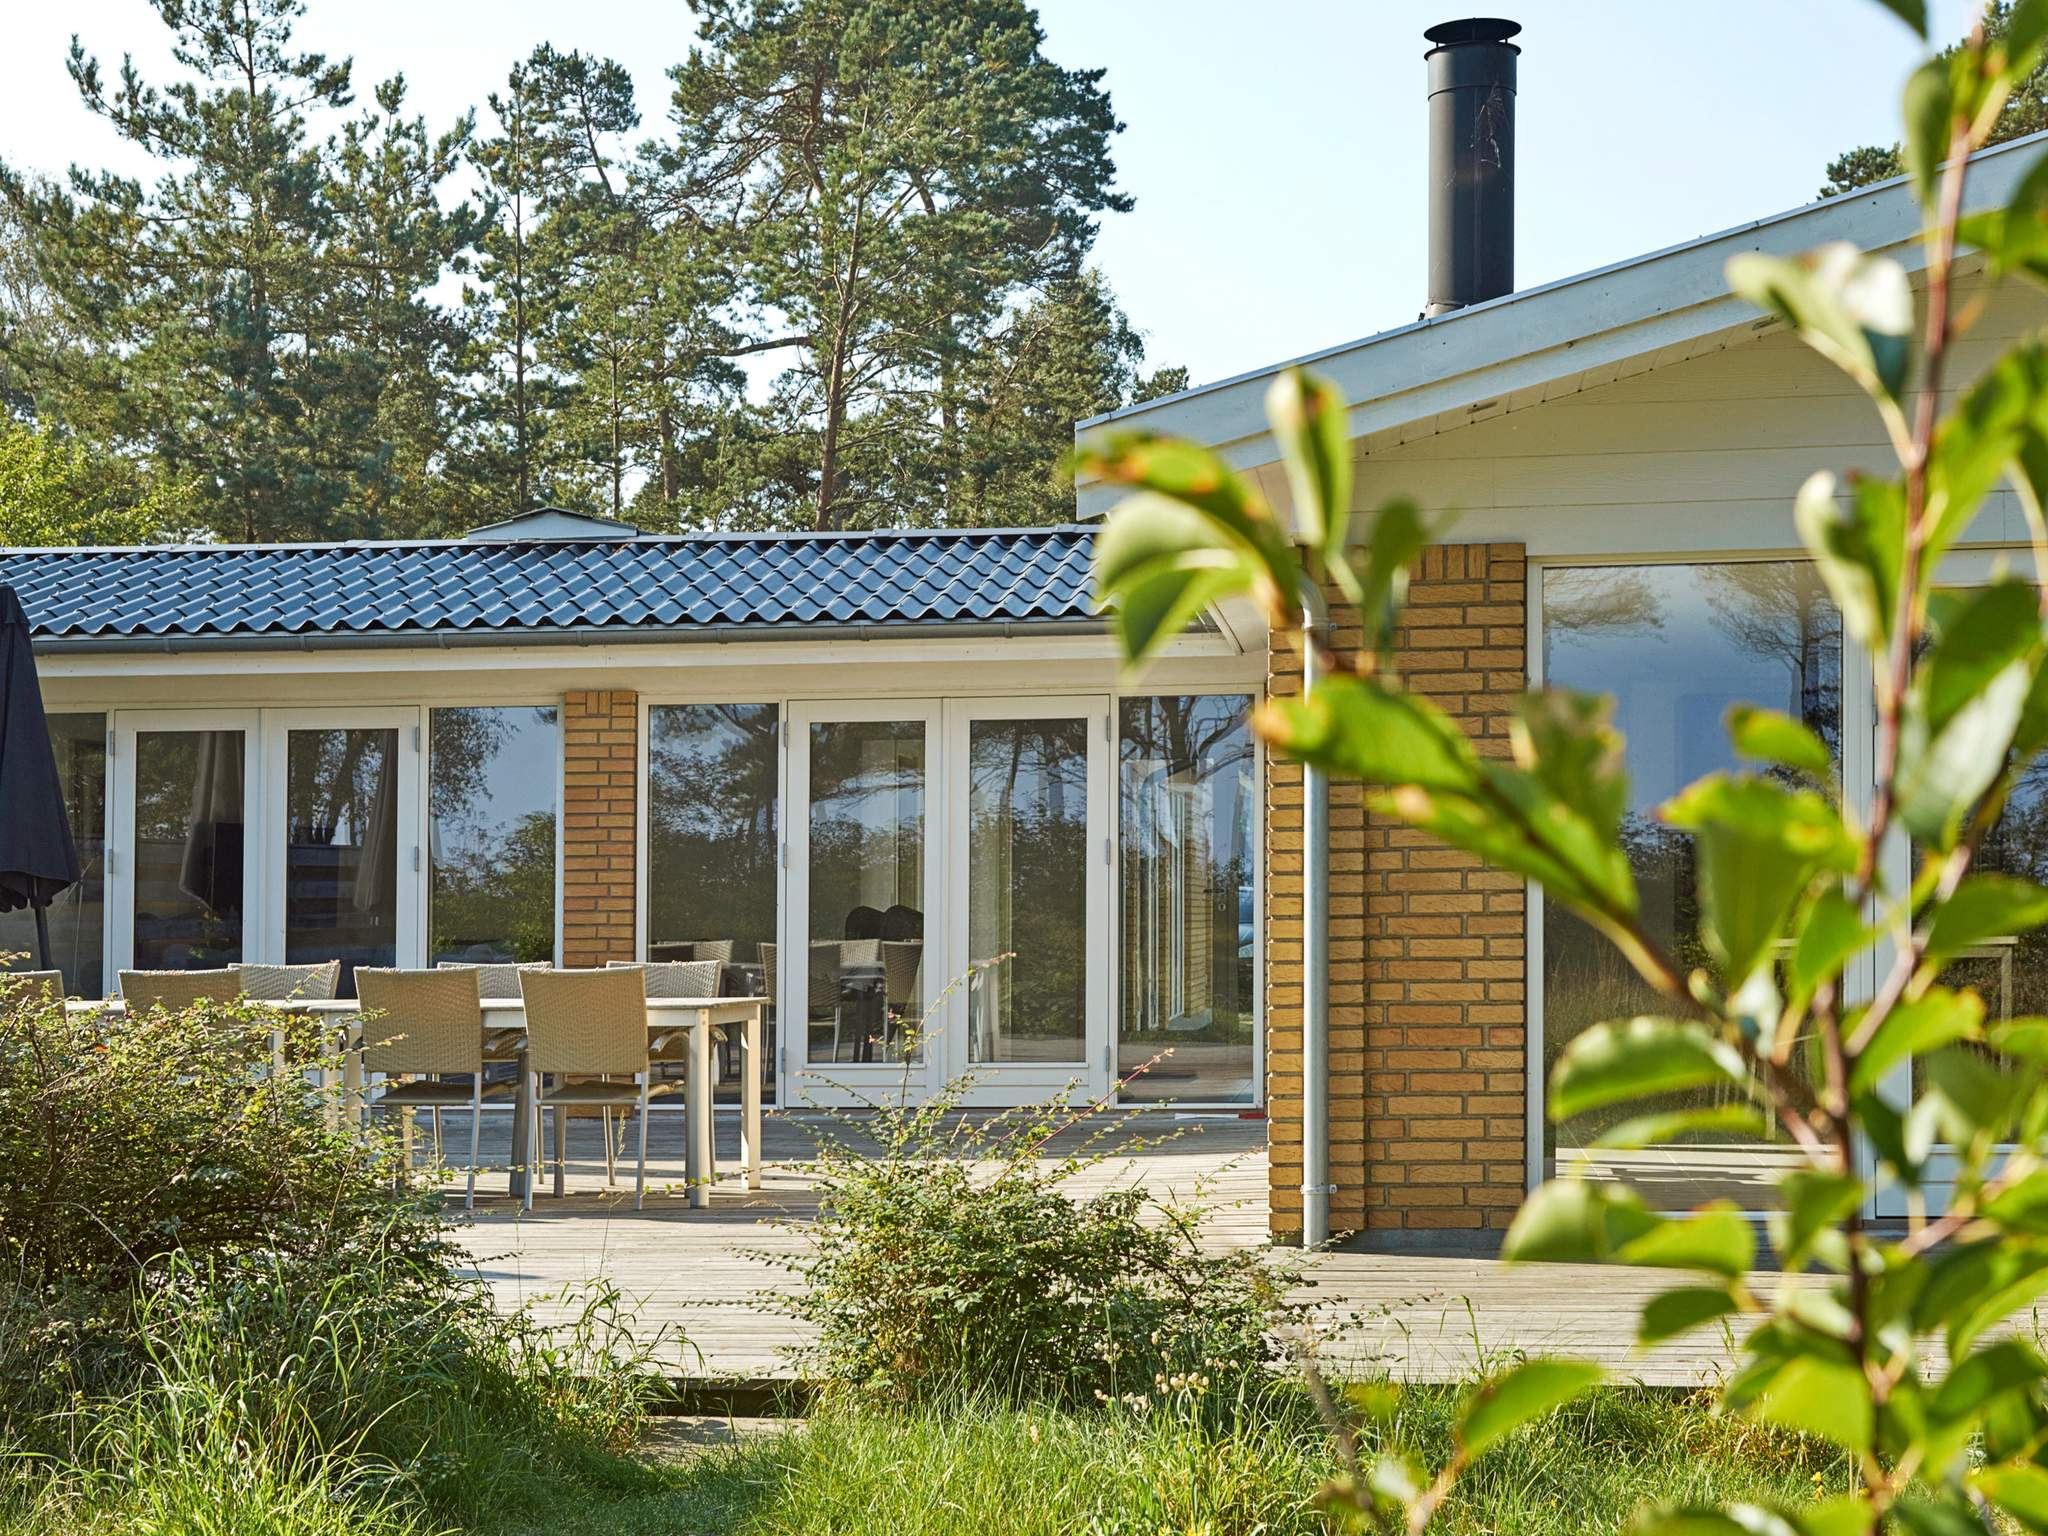 Ferienhaus Balka Strand (586595), Balke, , Bornholm, Dänemark, Bild 16